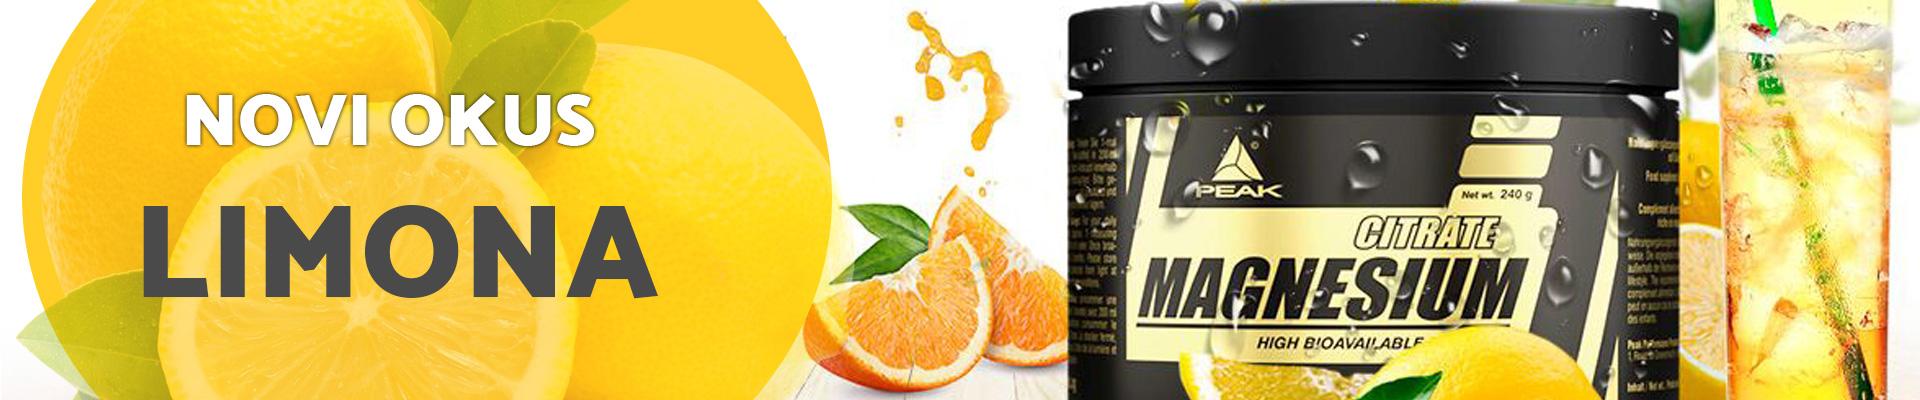 Limona okus